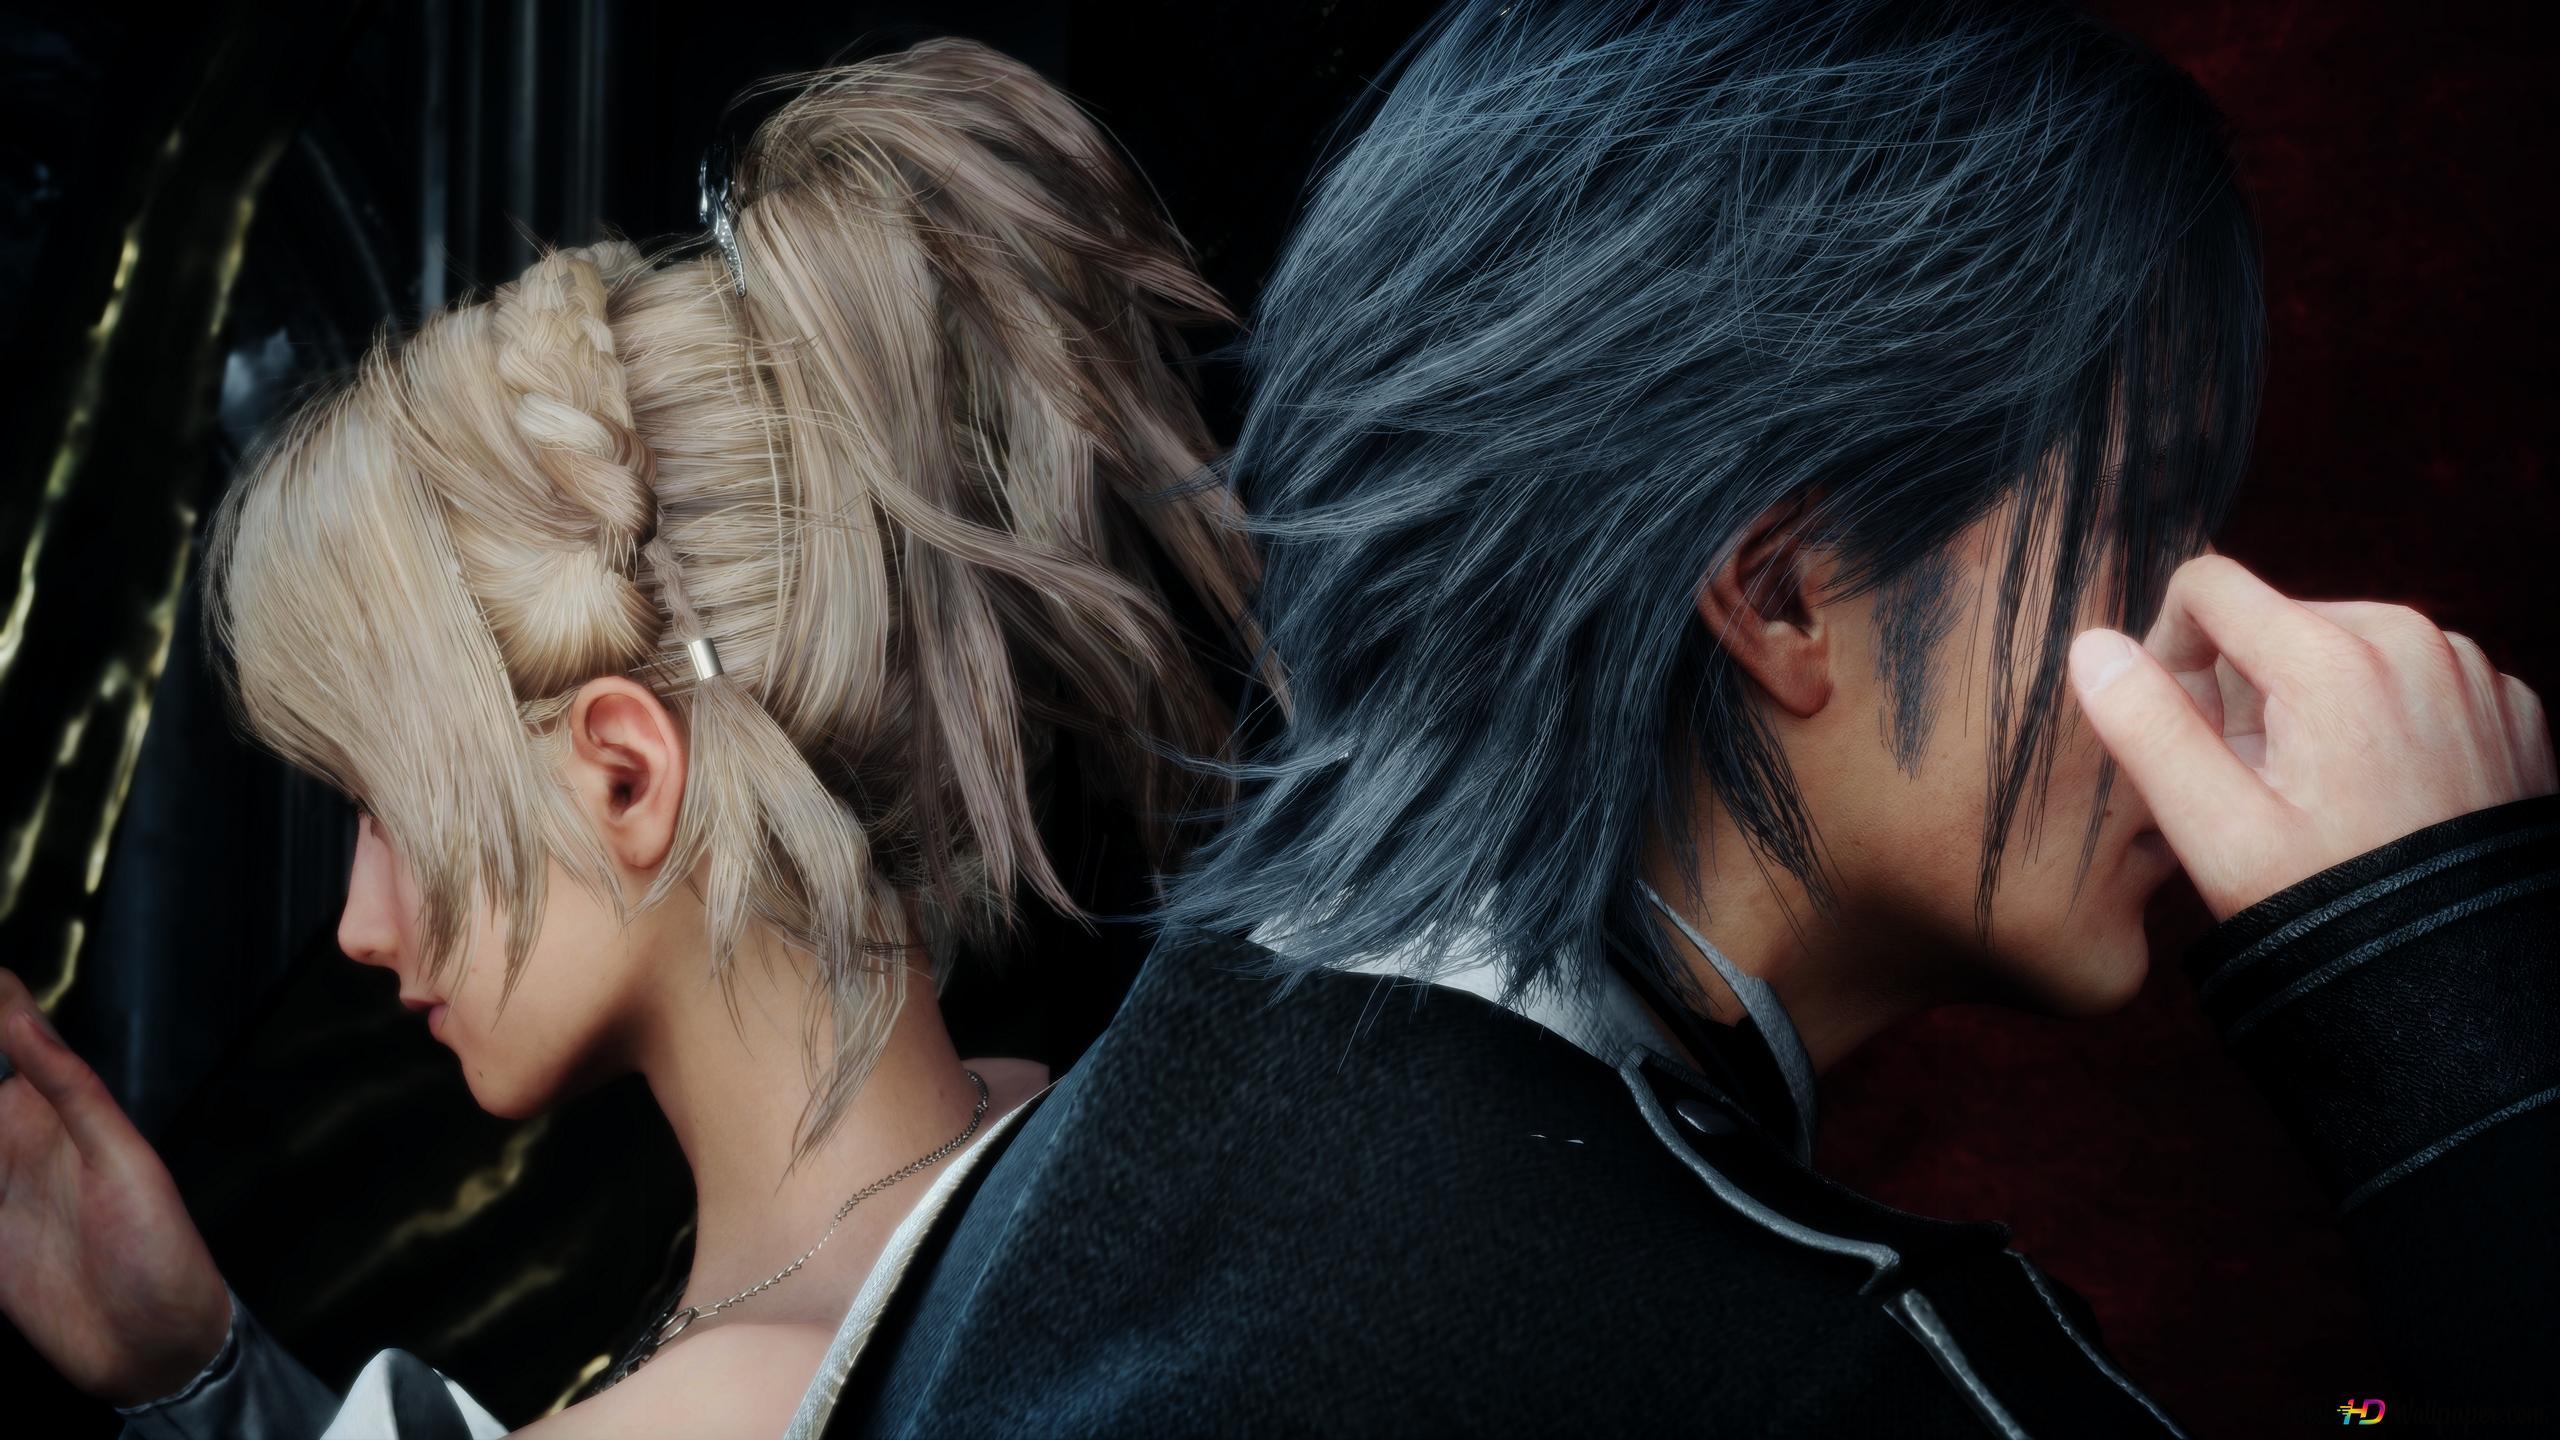 Final Fantasy Xv Noctis Weds Luna Hd Wallpaper Download